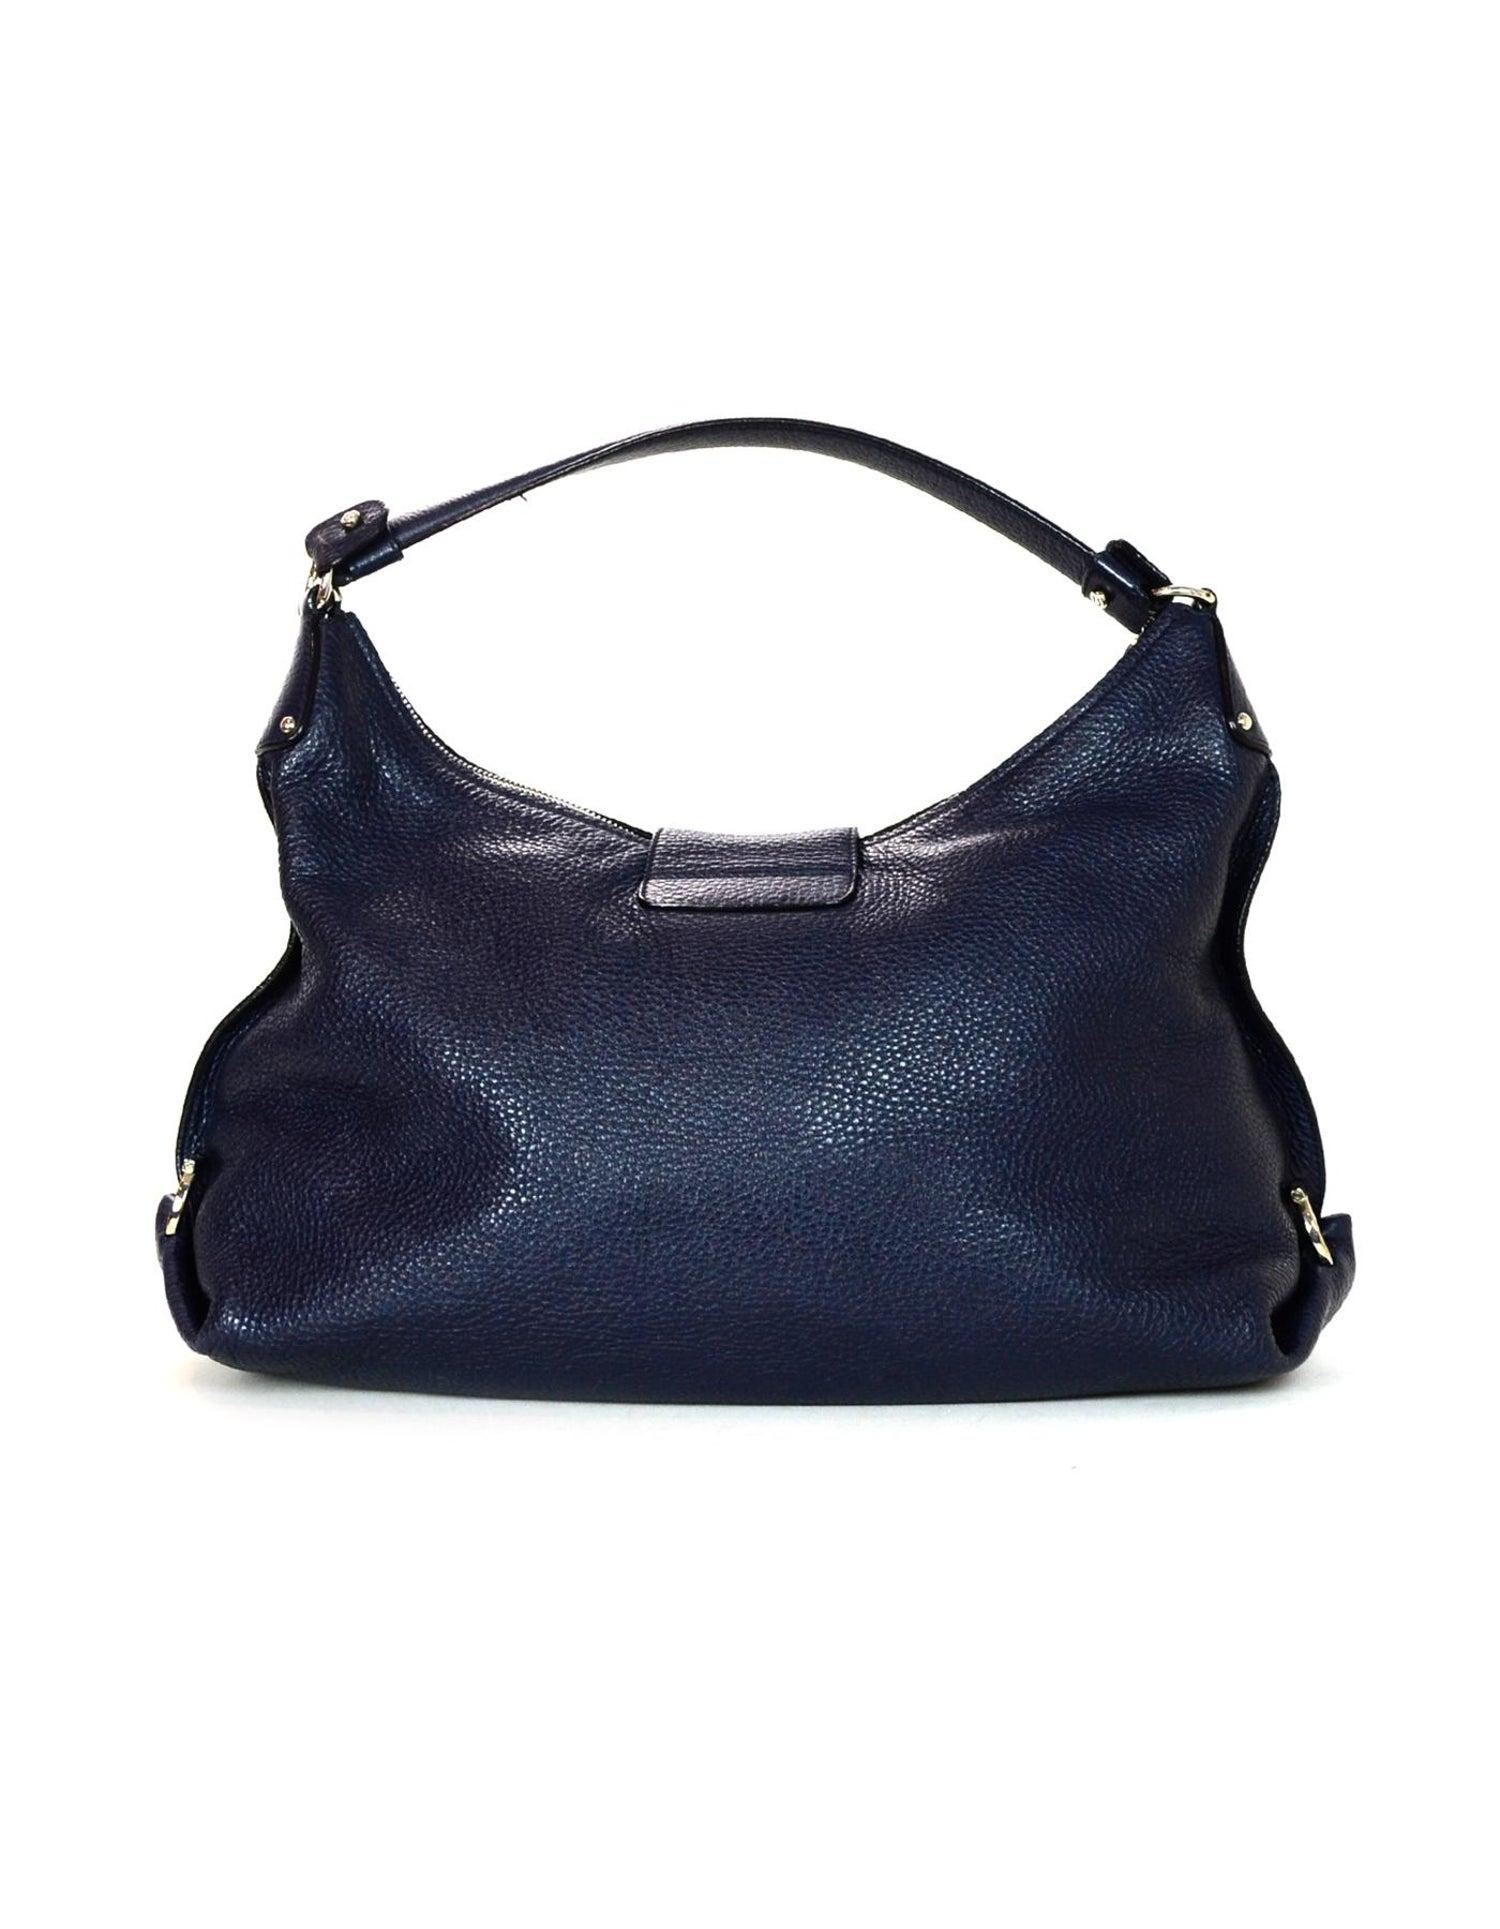 991bd1c74c27 Salvatore Ferragamo Navy Pebbled Leather Fanisa Mediterraneo Gancini Hobo  Bag For Sale at 1stdibs